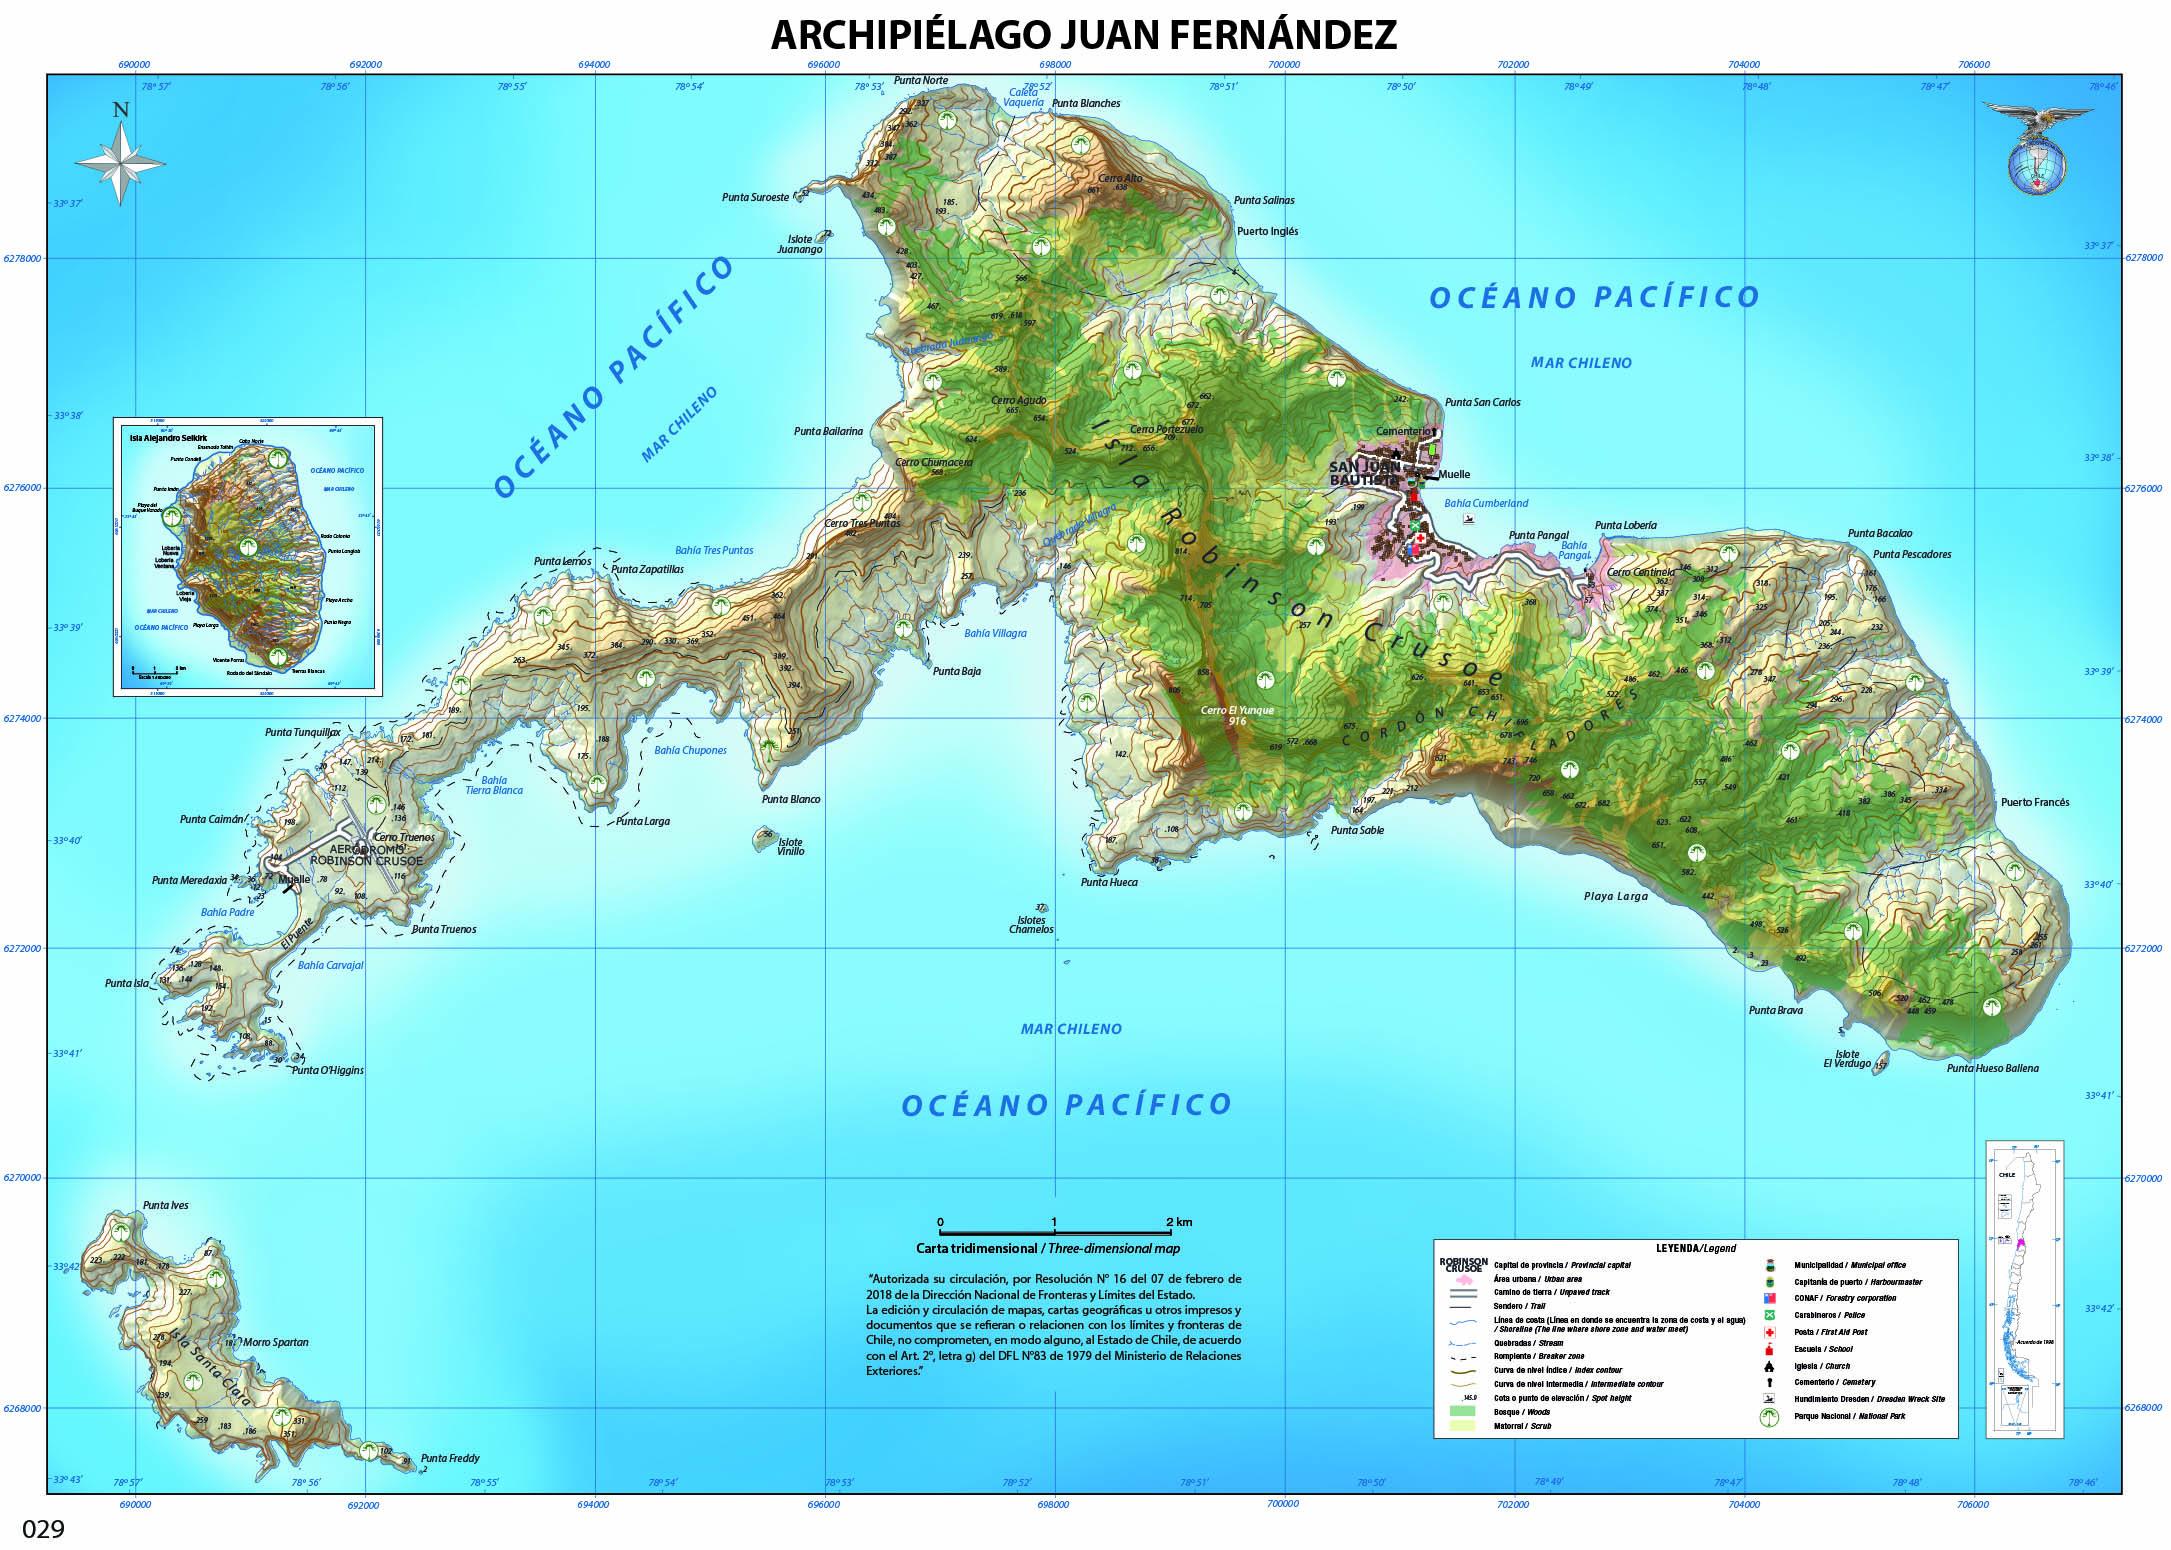 archipielago juan fernandez 16